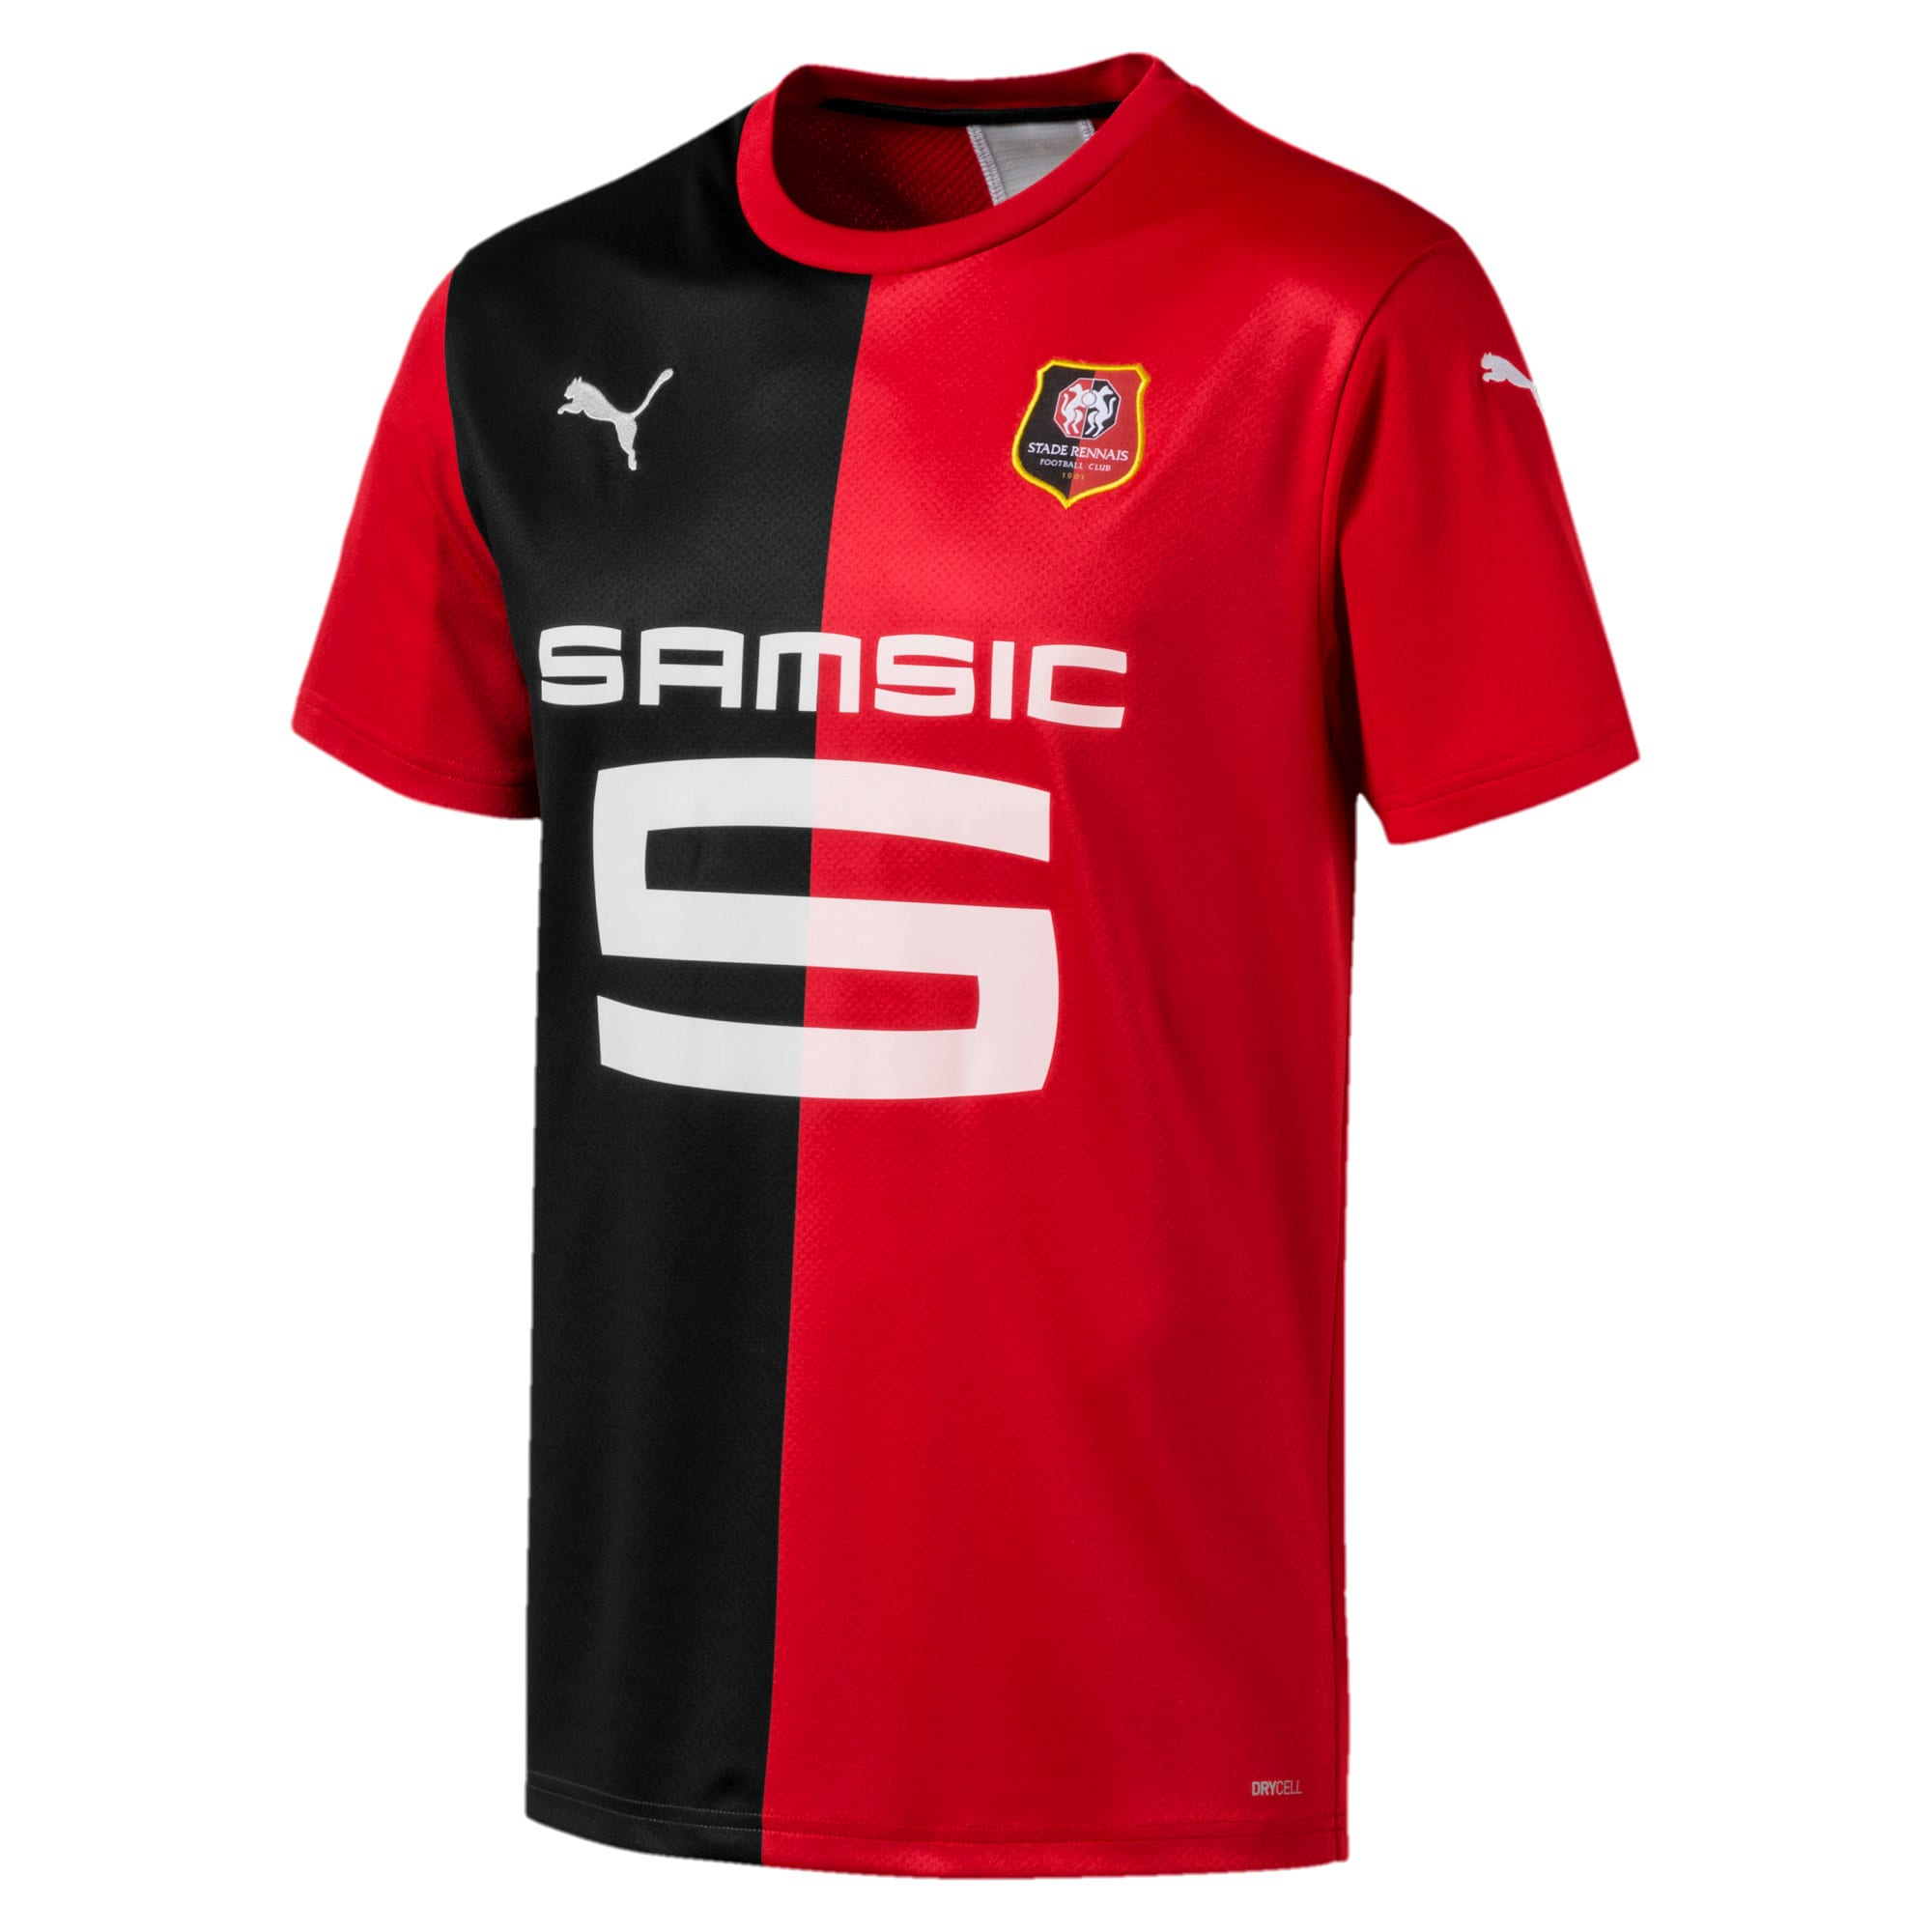 Thumbnail 1 of Stade Rennes FC Herren Replica Heimtrikot, Puma Red-Puma Black, medium